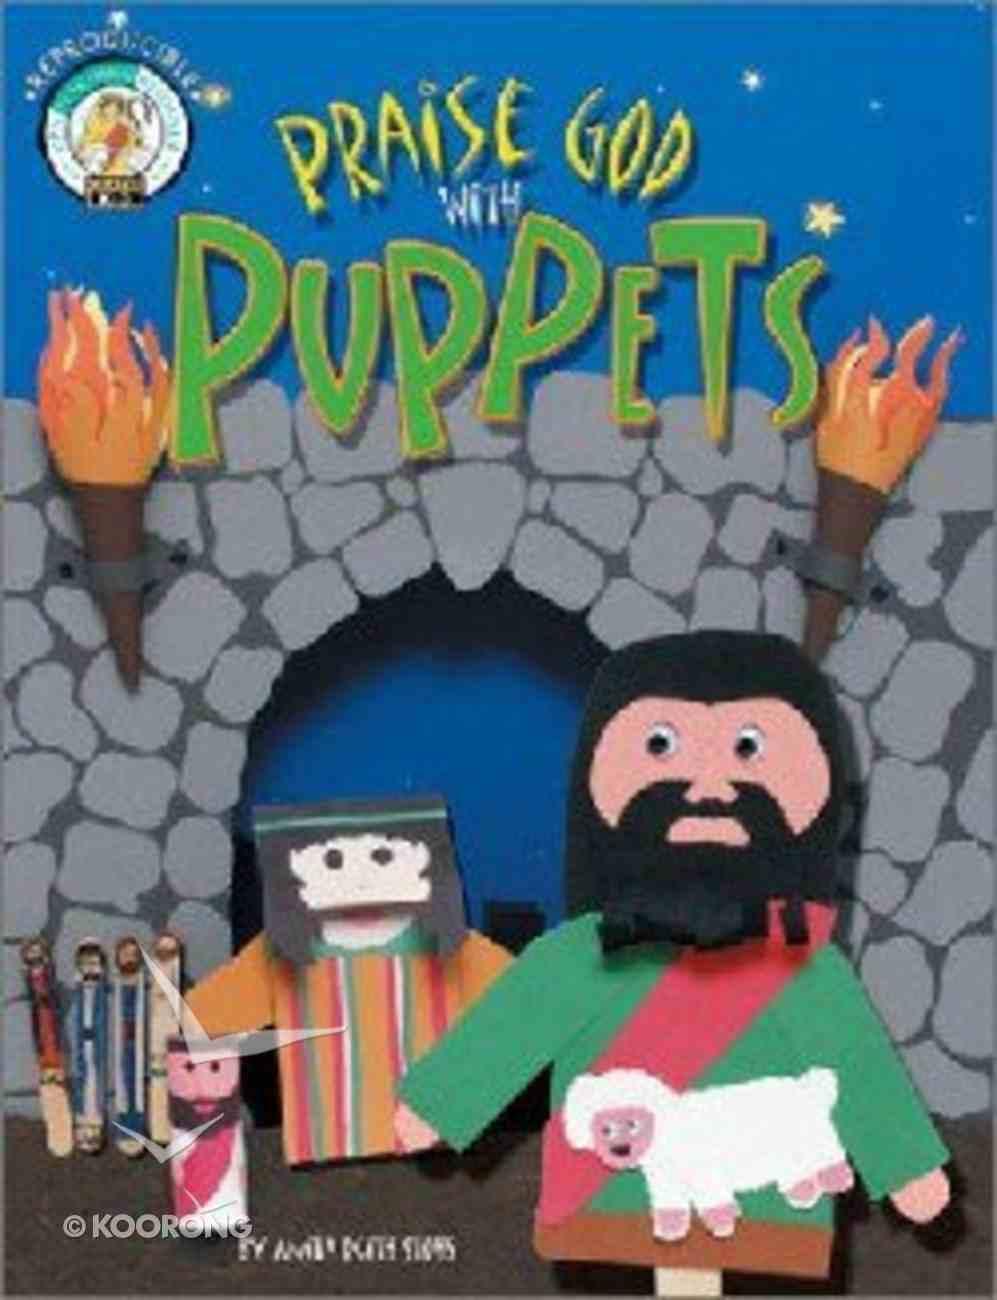 Praise God With Puppets Hardback